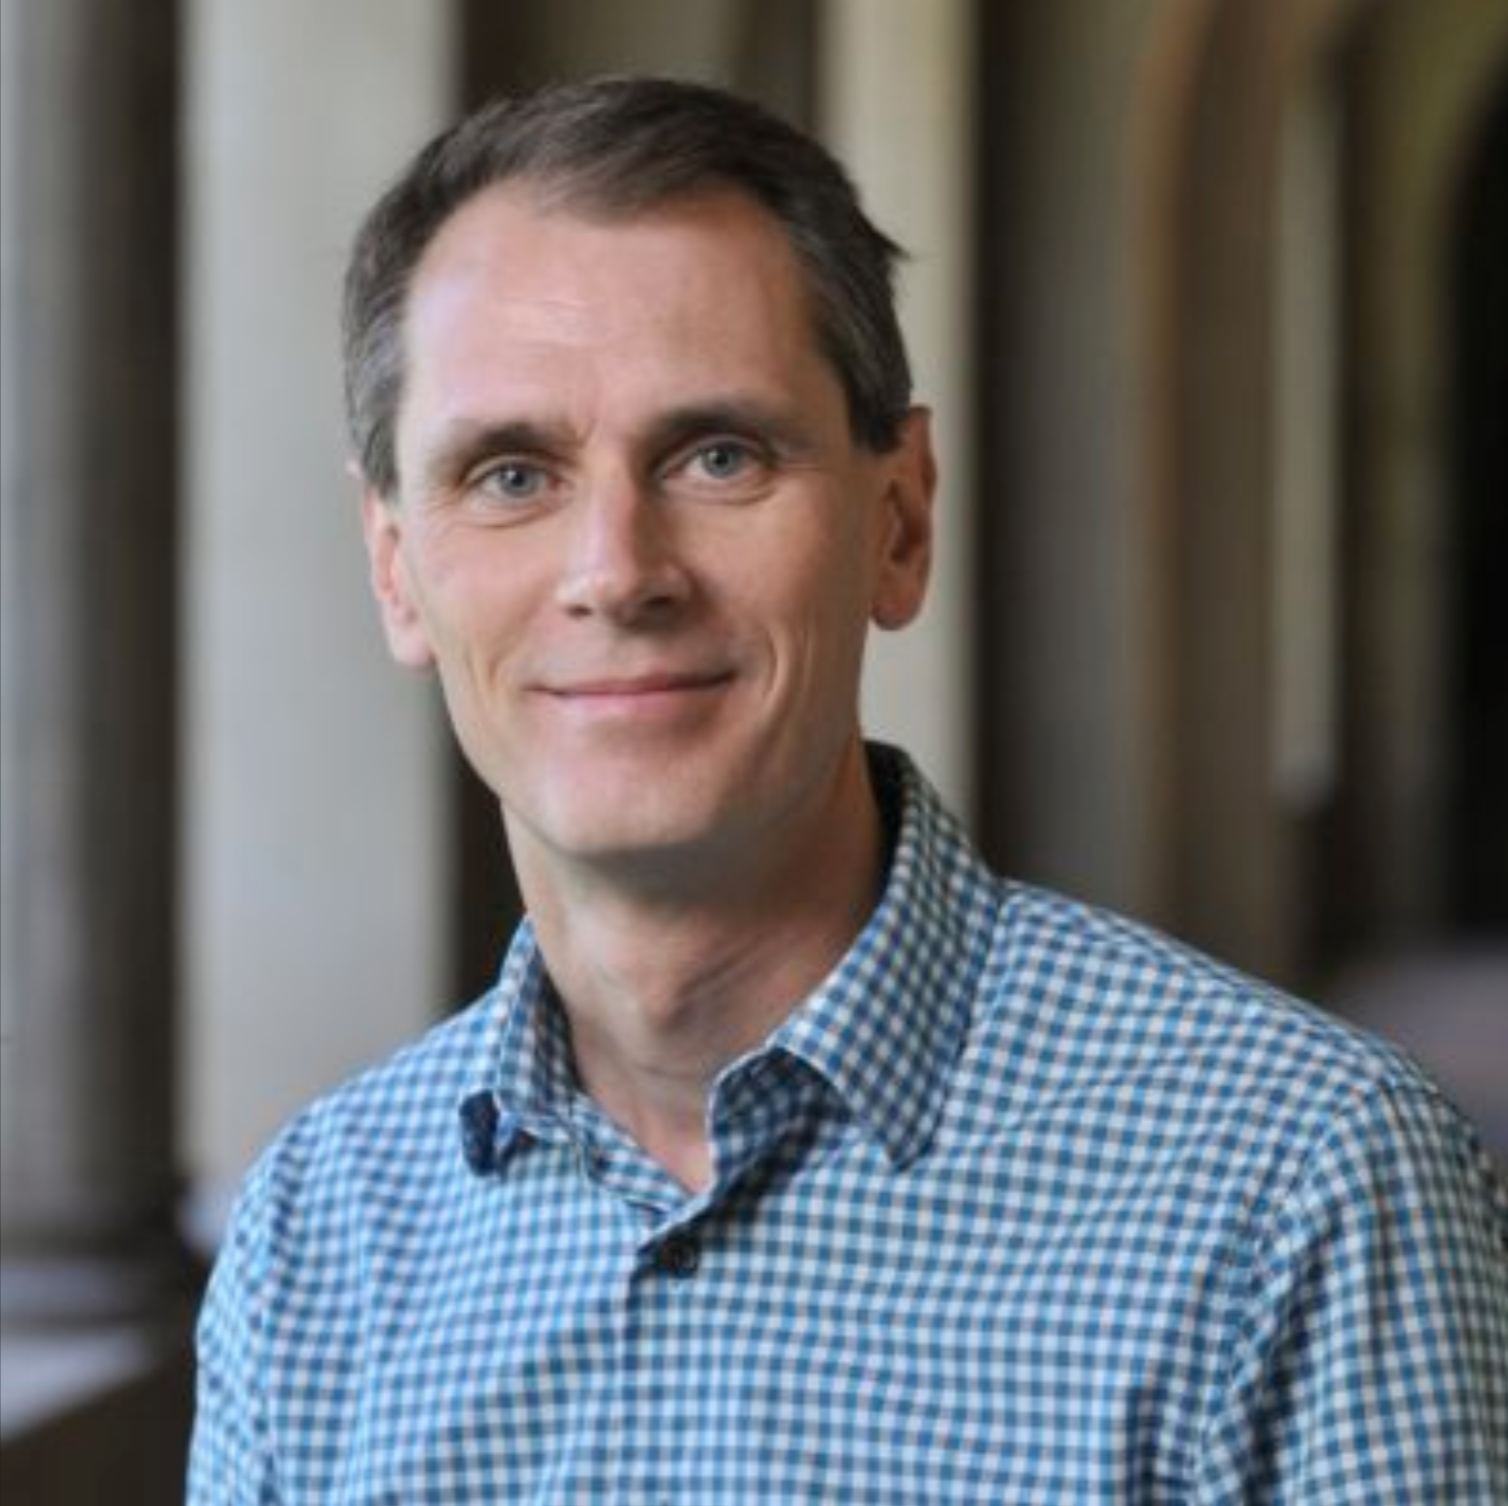 Professor David Studdert  Professor of Law and Medicine, Stanford University